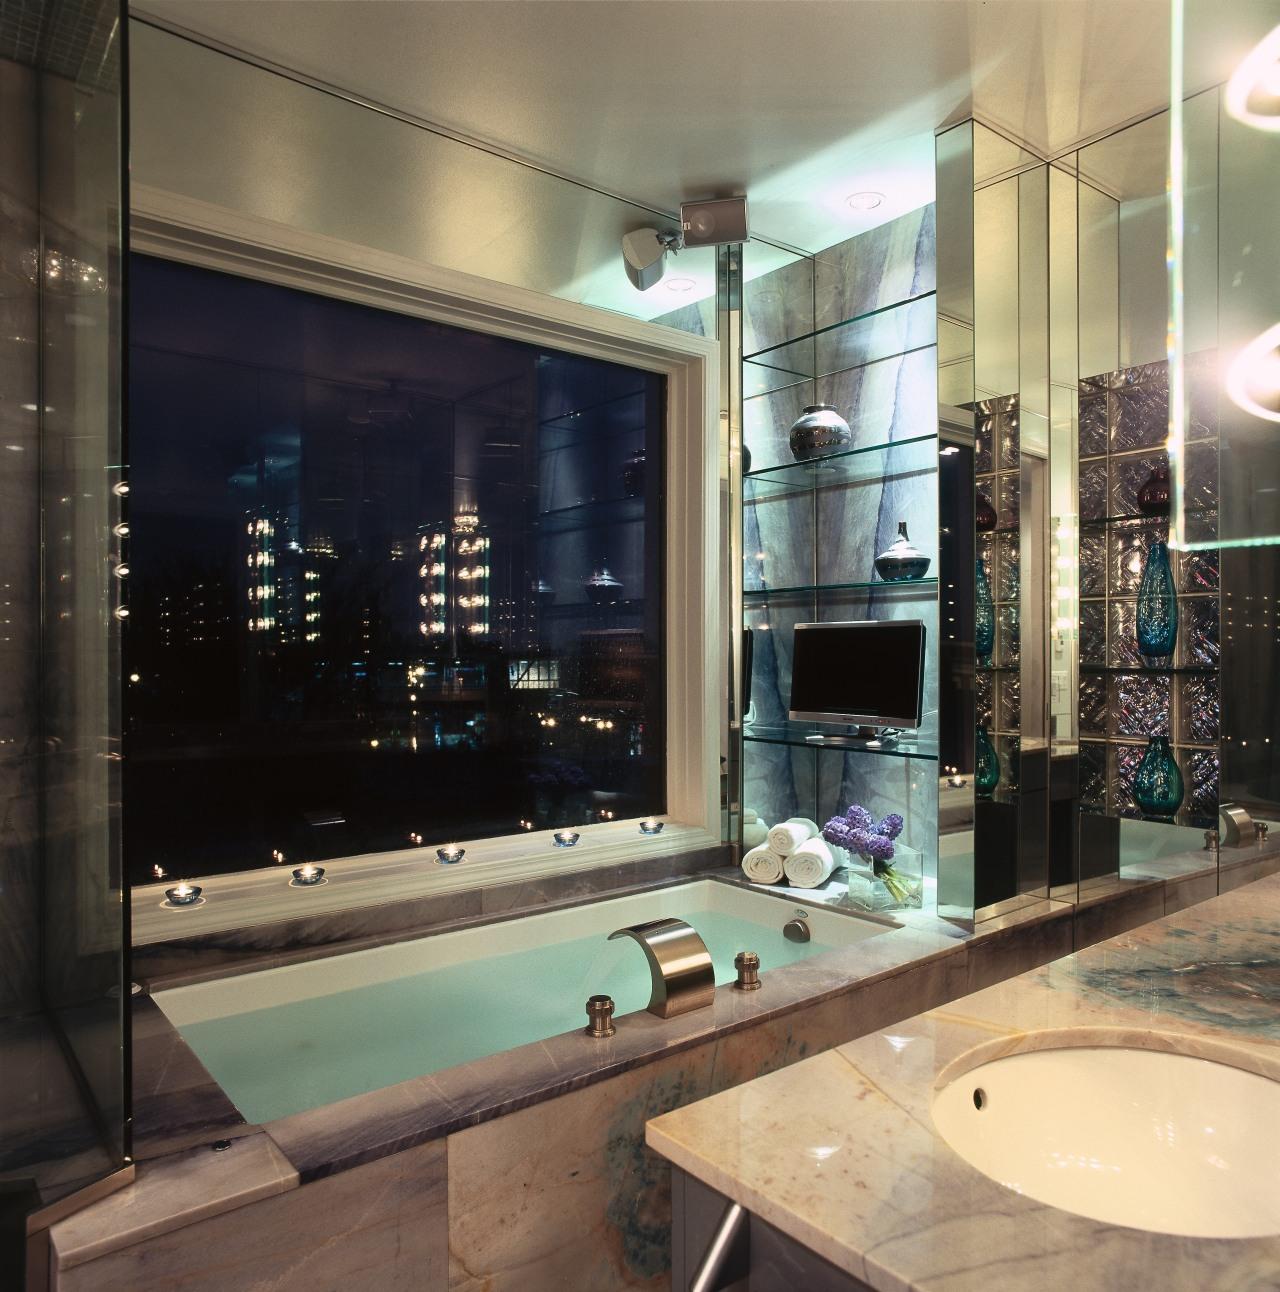 A view of the ensuite, lights, tiled tub bathroom, billiard room, glass, interior design, room, black